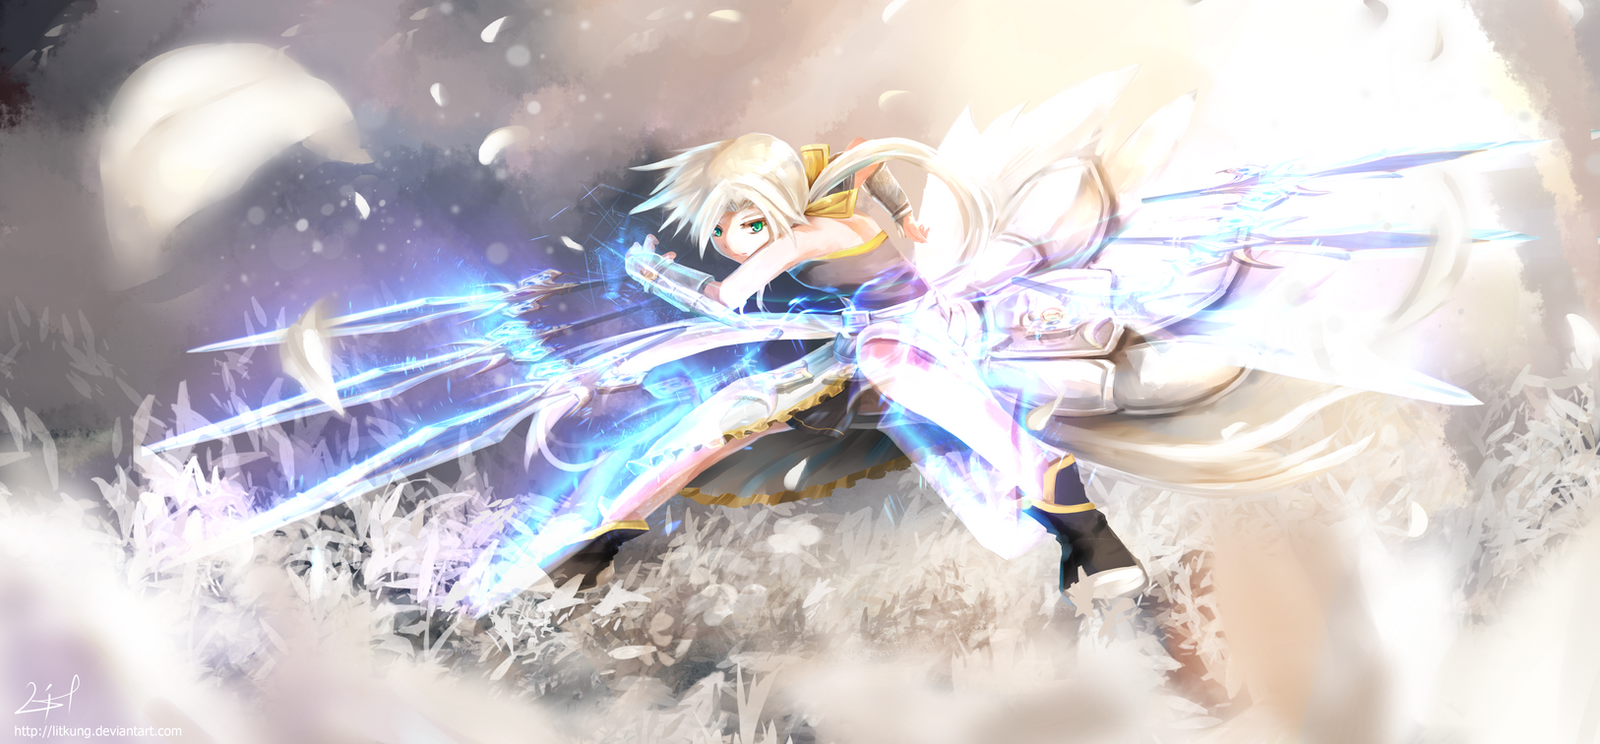 Perceval Noblisse Brave_frontier___untouchable_lily_by_litkung-d7rkk86